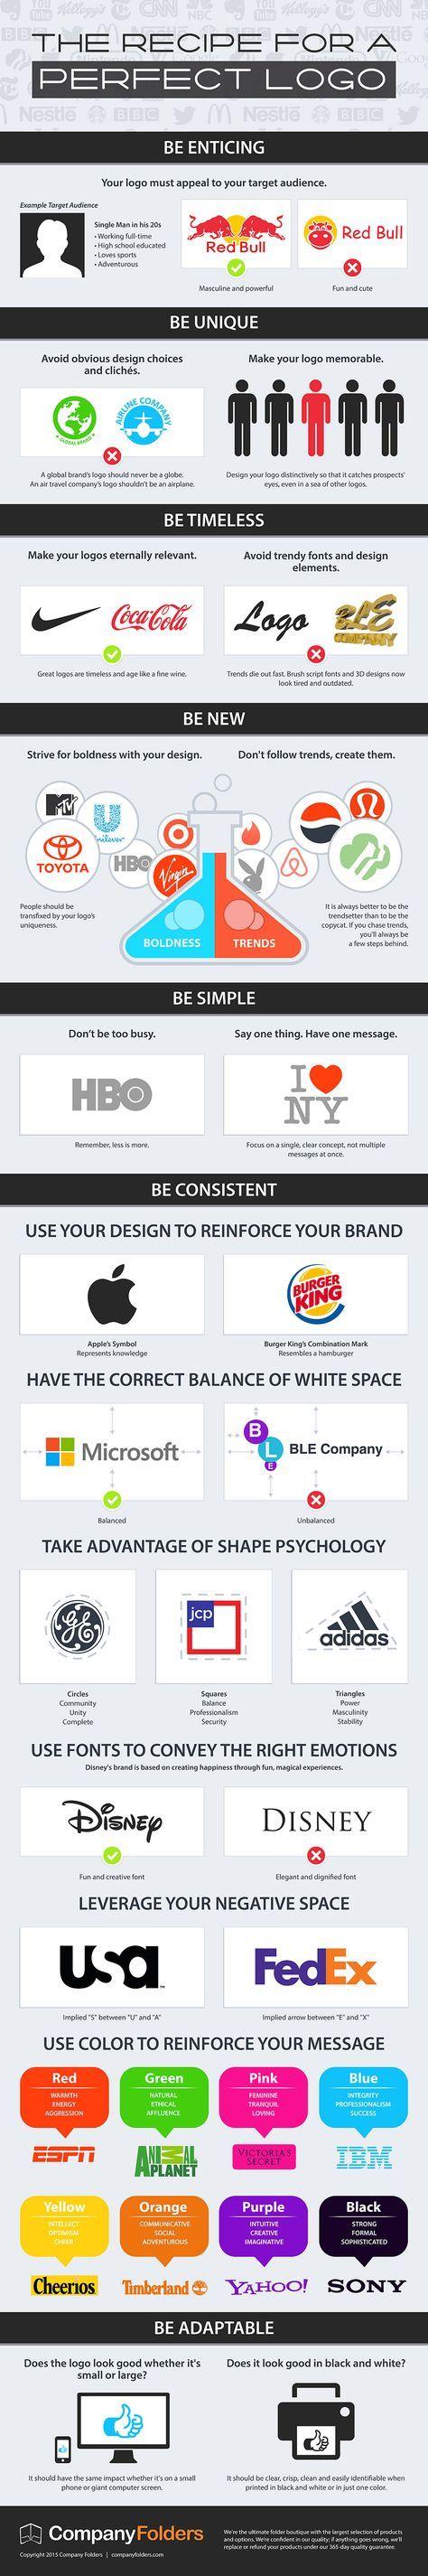 perfect-logo-design-infographic-2